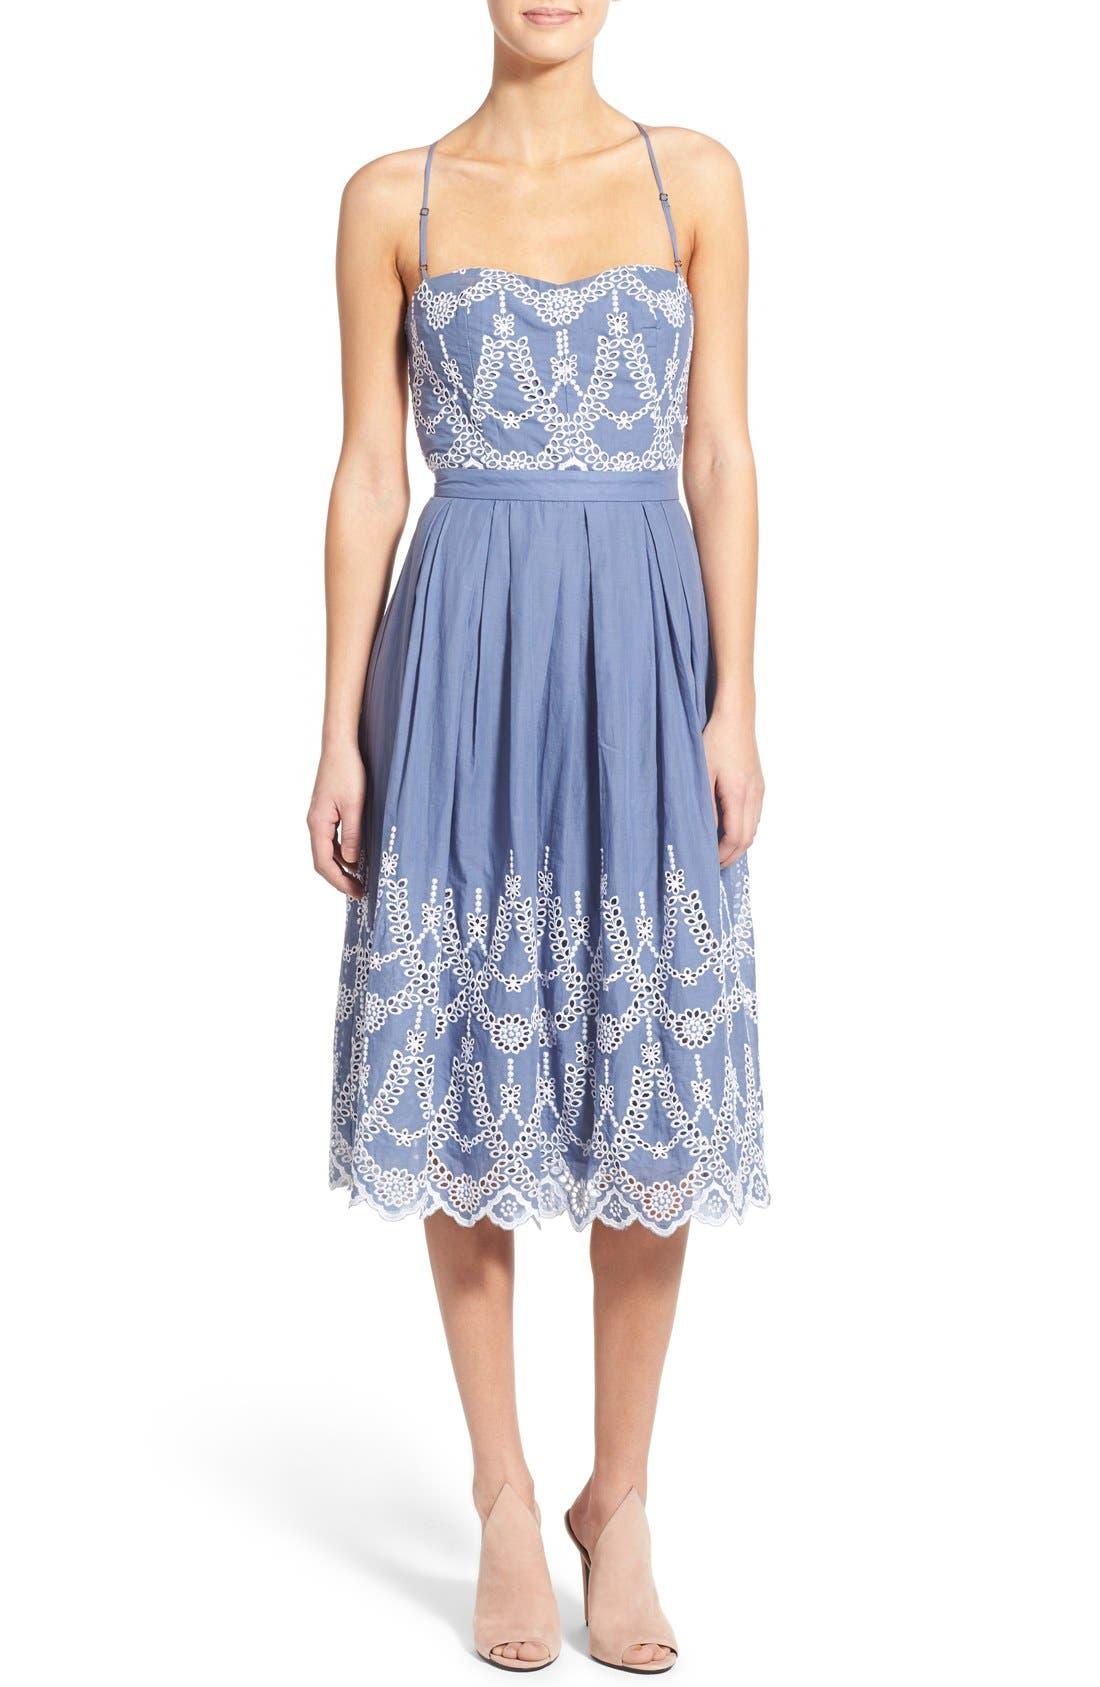 Alternate Image 1 Selected - KENDALL + KYLIE Cotton Eyelet Halter Dress